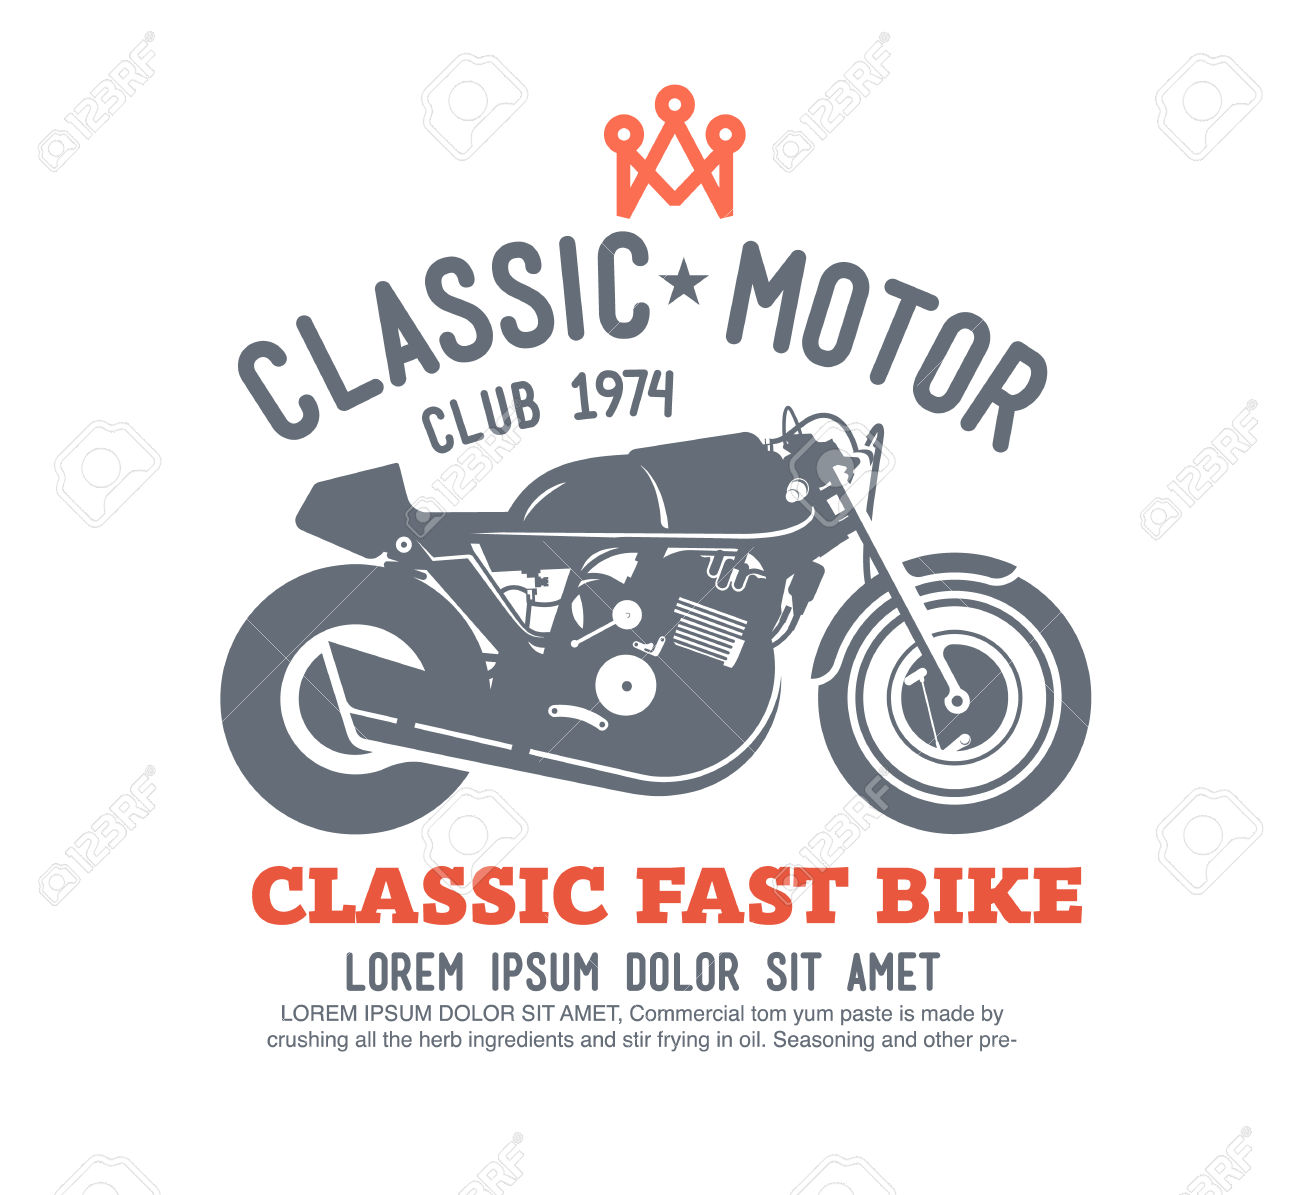 Logo Motor Club Vector. Royalty Free Cliparts, Vectors, And Stock.